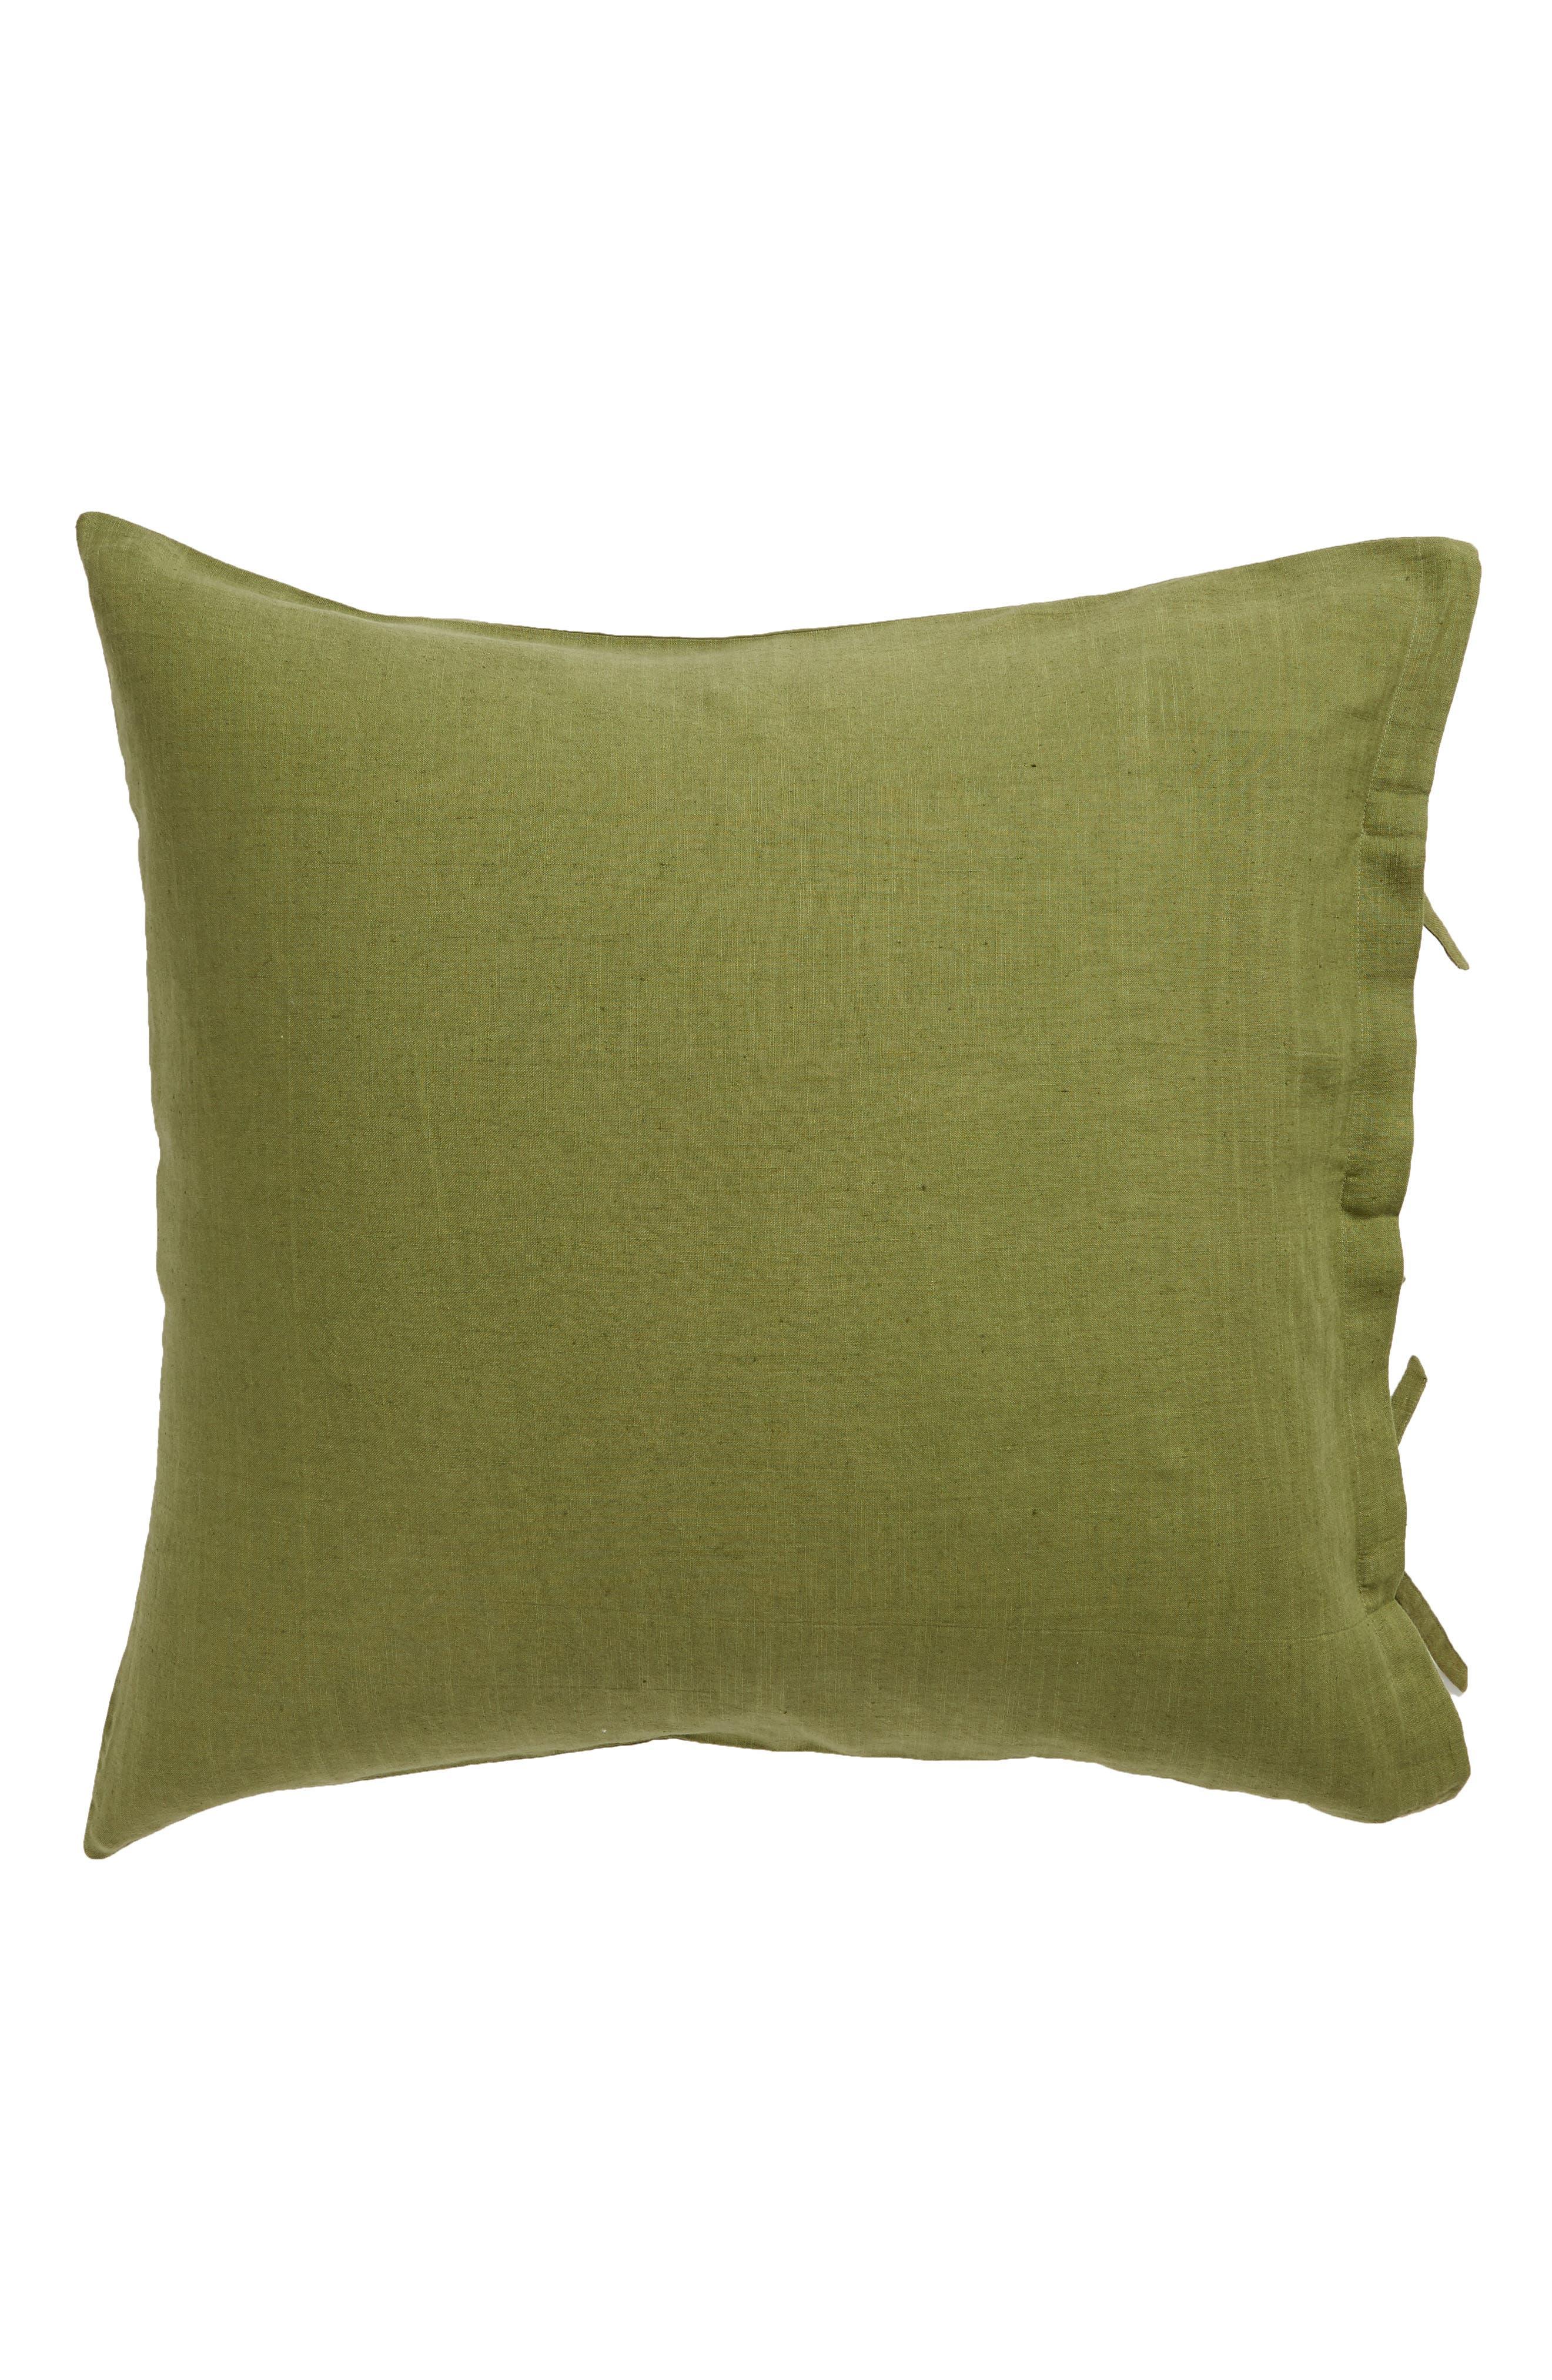 TREASURE & BOND,                             Relaxed Cotton & Linen Euro Sham,                             Main thumbnail 1, color,                             OLIVE SPICE